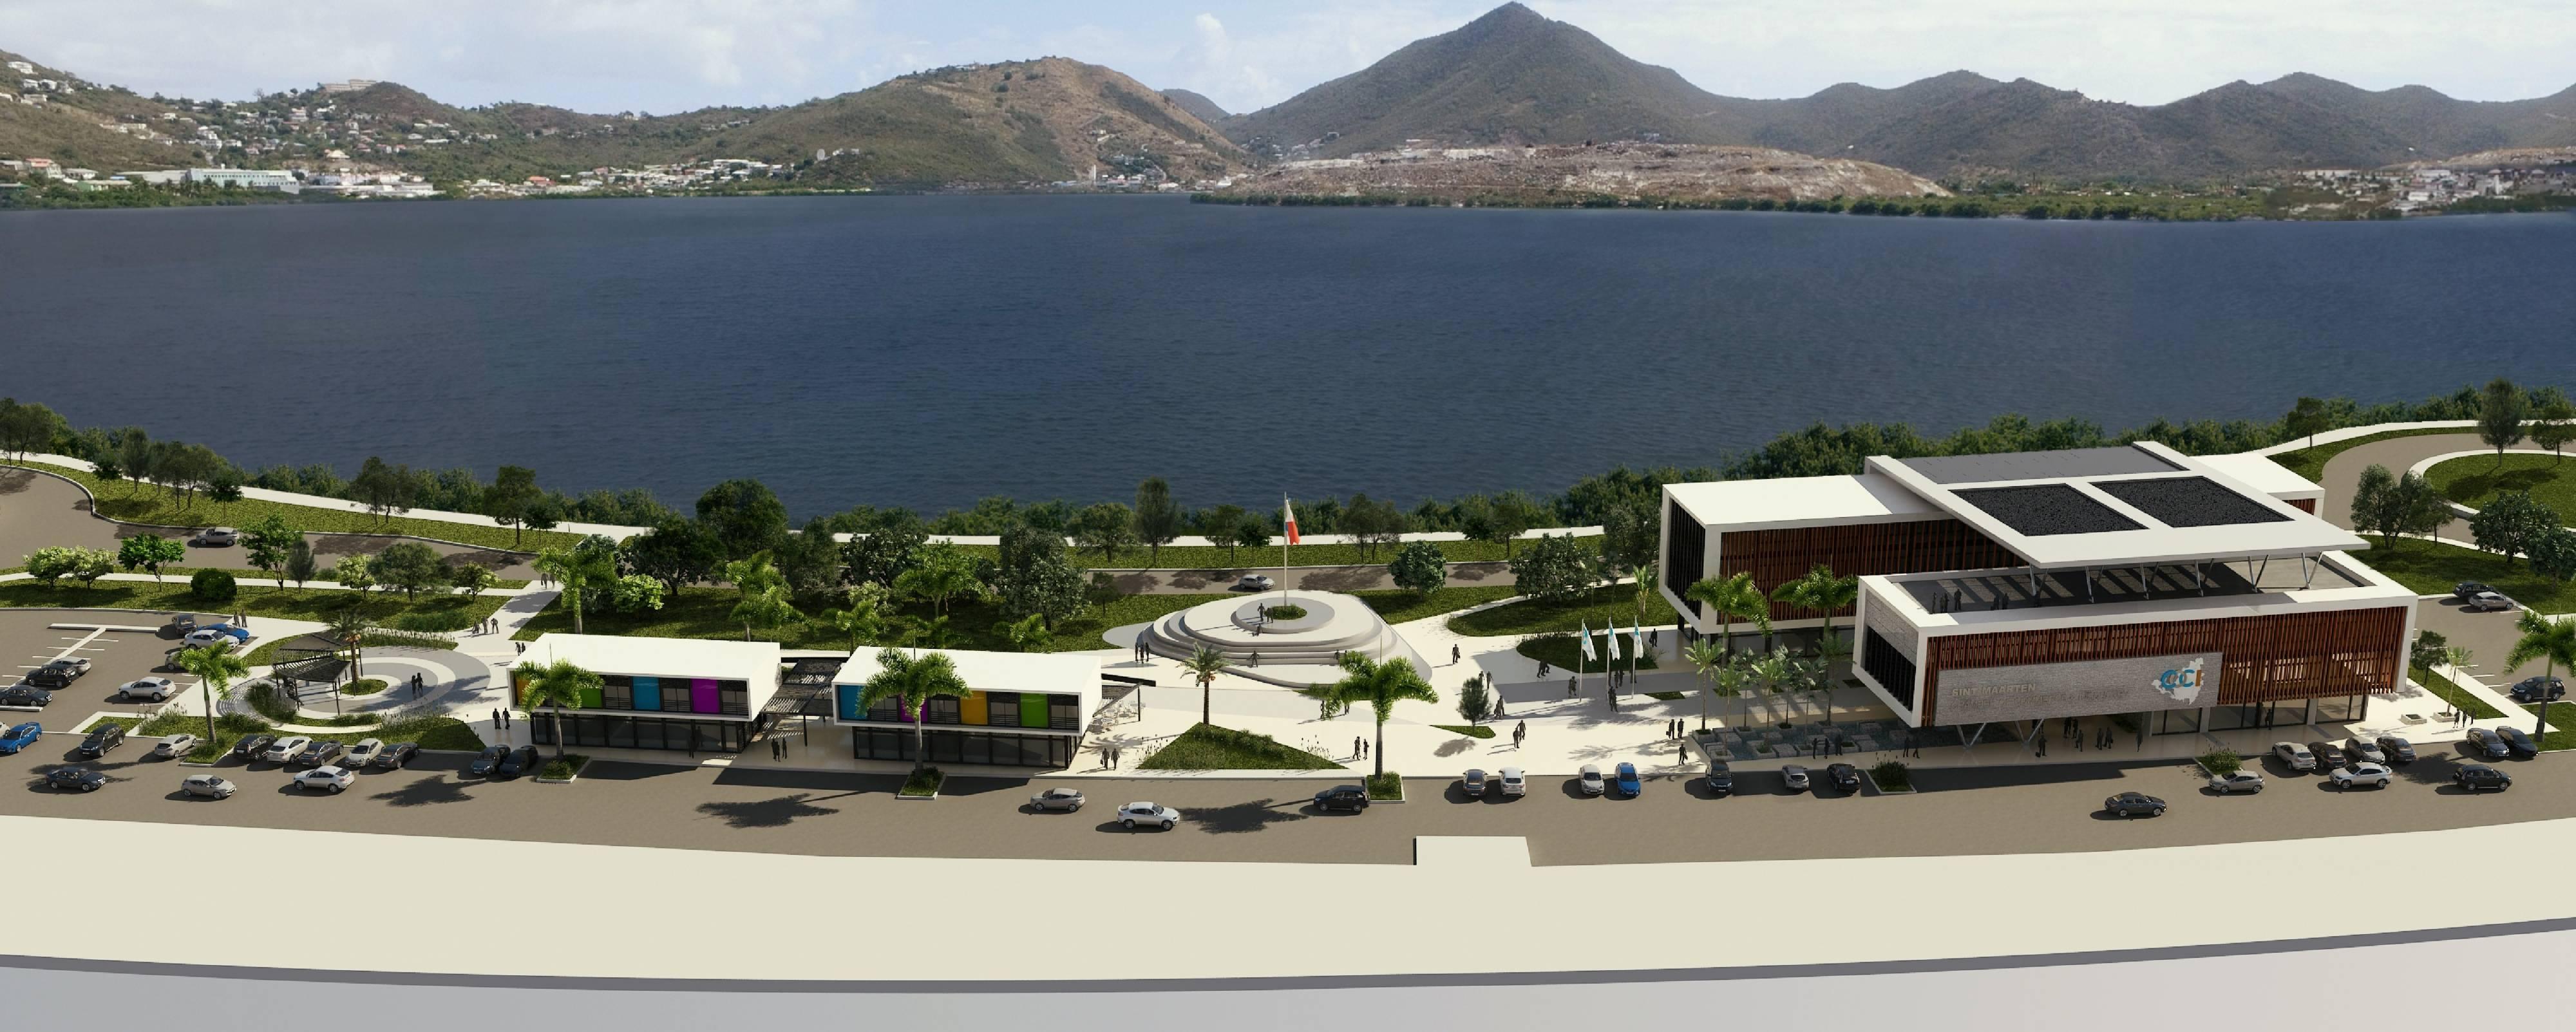 Chamber of Commerce Sint Maarten - 71313-2.jpg